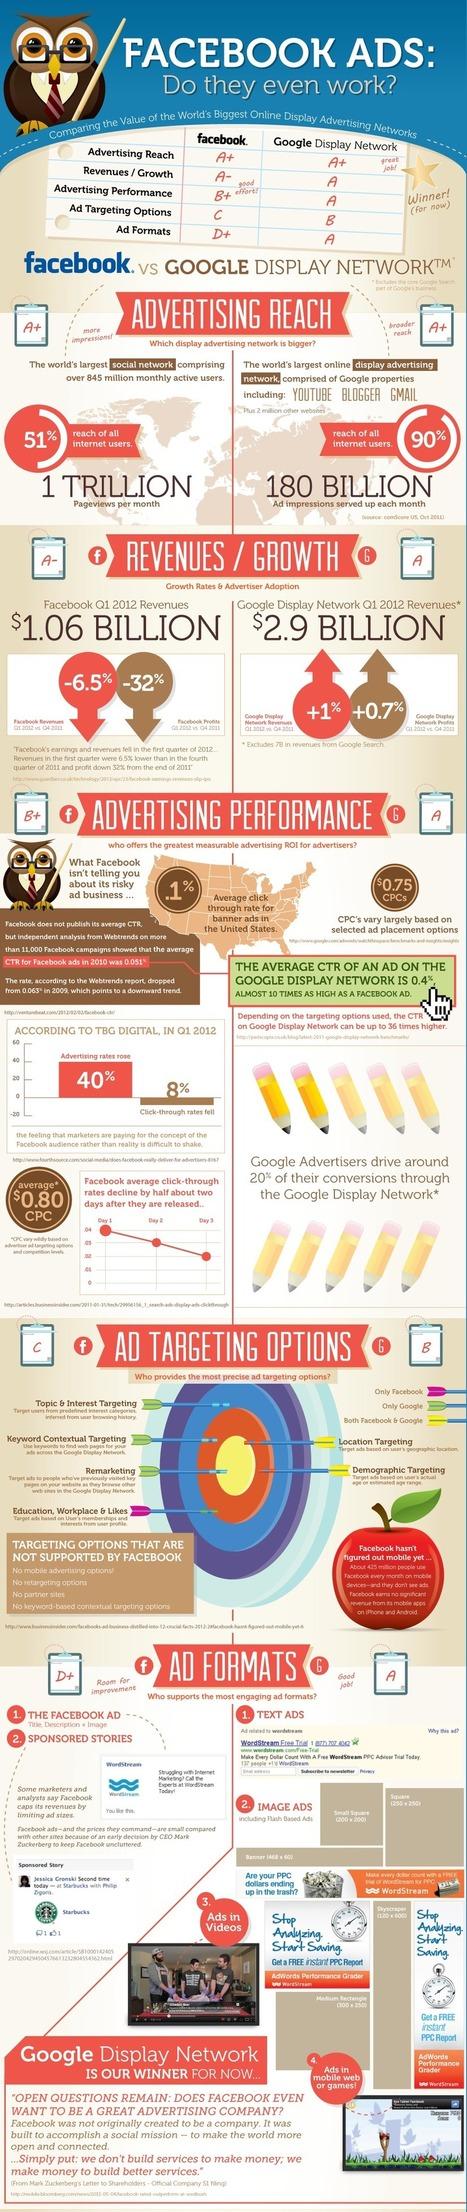 Online Advertising - Facebook vs. Google | iRISEmedia.com | Digital Marketing | Scoop.it